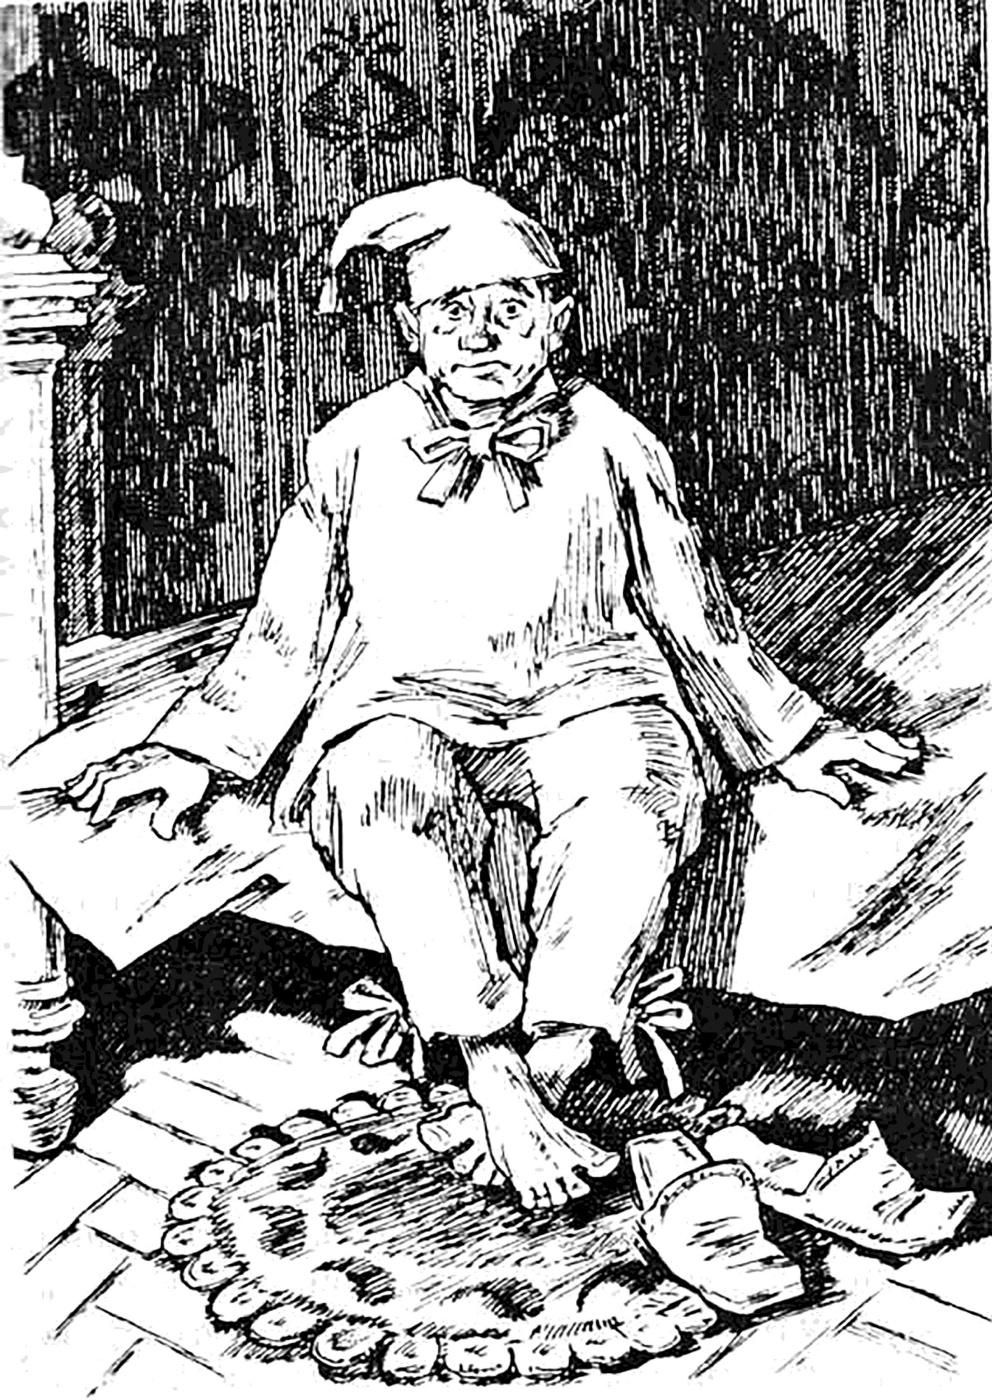 Alexander Vasilievich Kuzmin. Exclamation point. A.P. Chekhov.